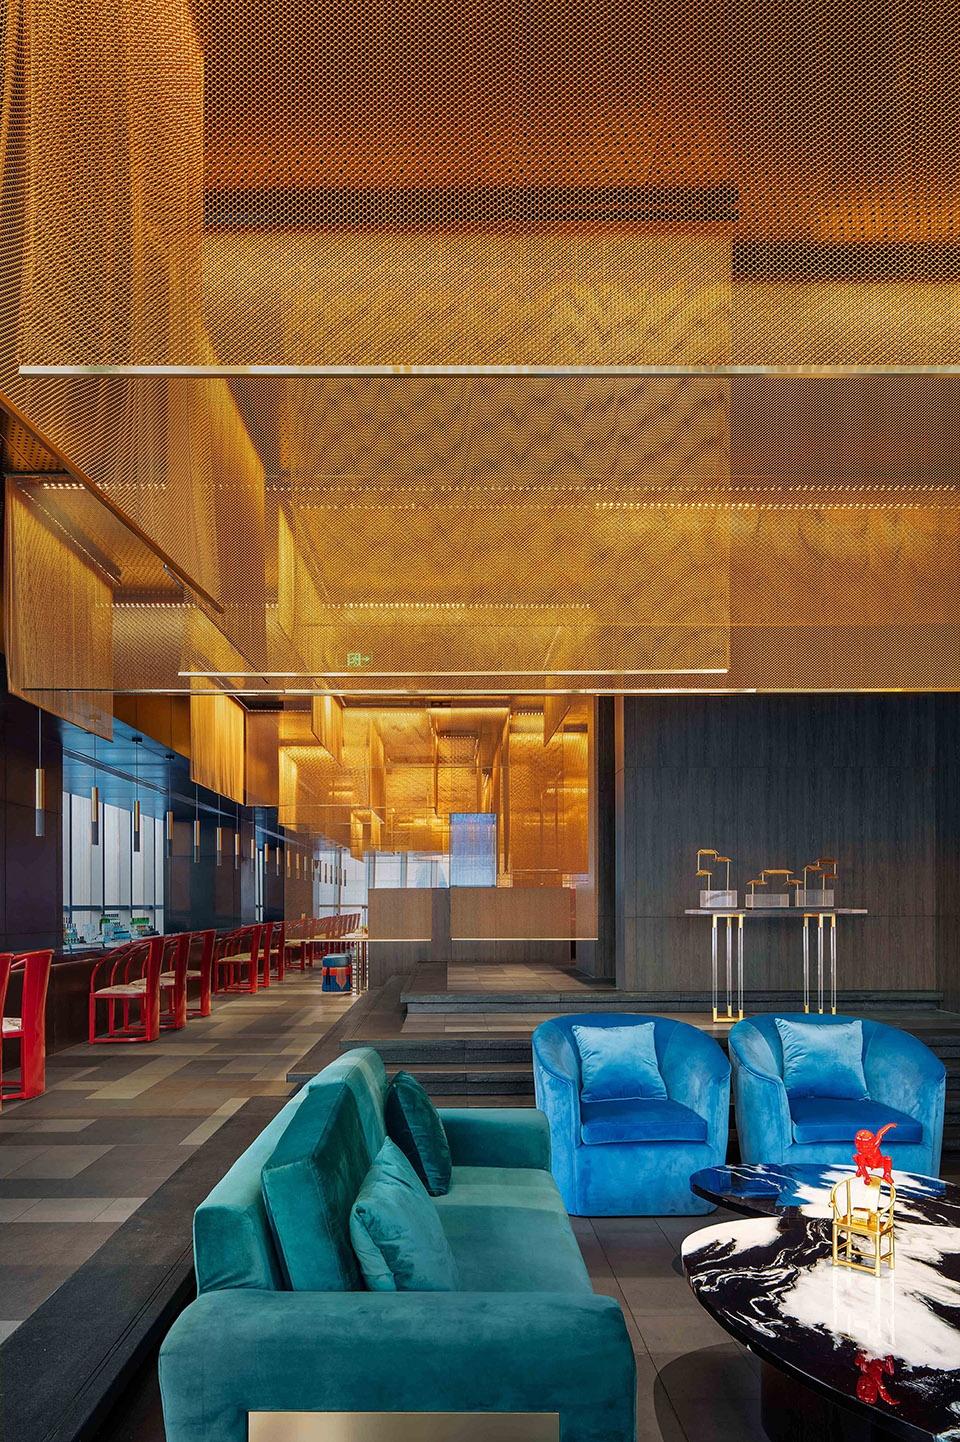 006-the-top-of-cloud-restaurant-china-by-rsaaburo-ziyu-zhuang-960x1442.jpg